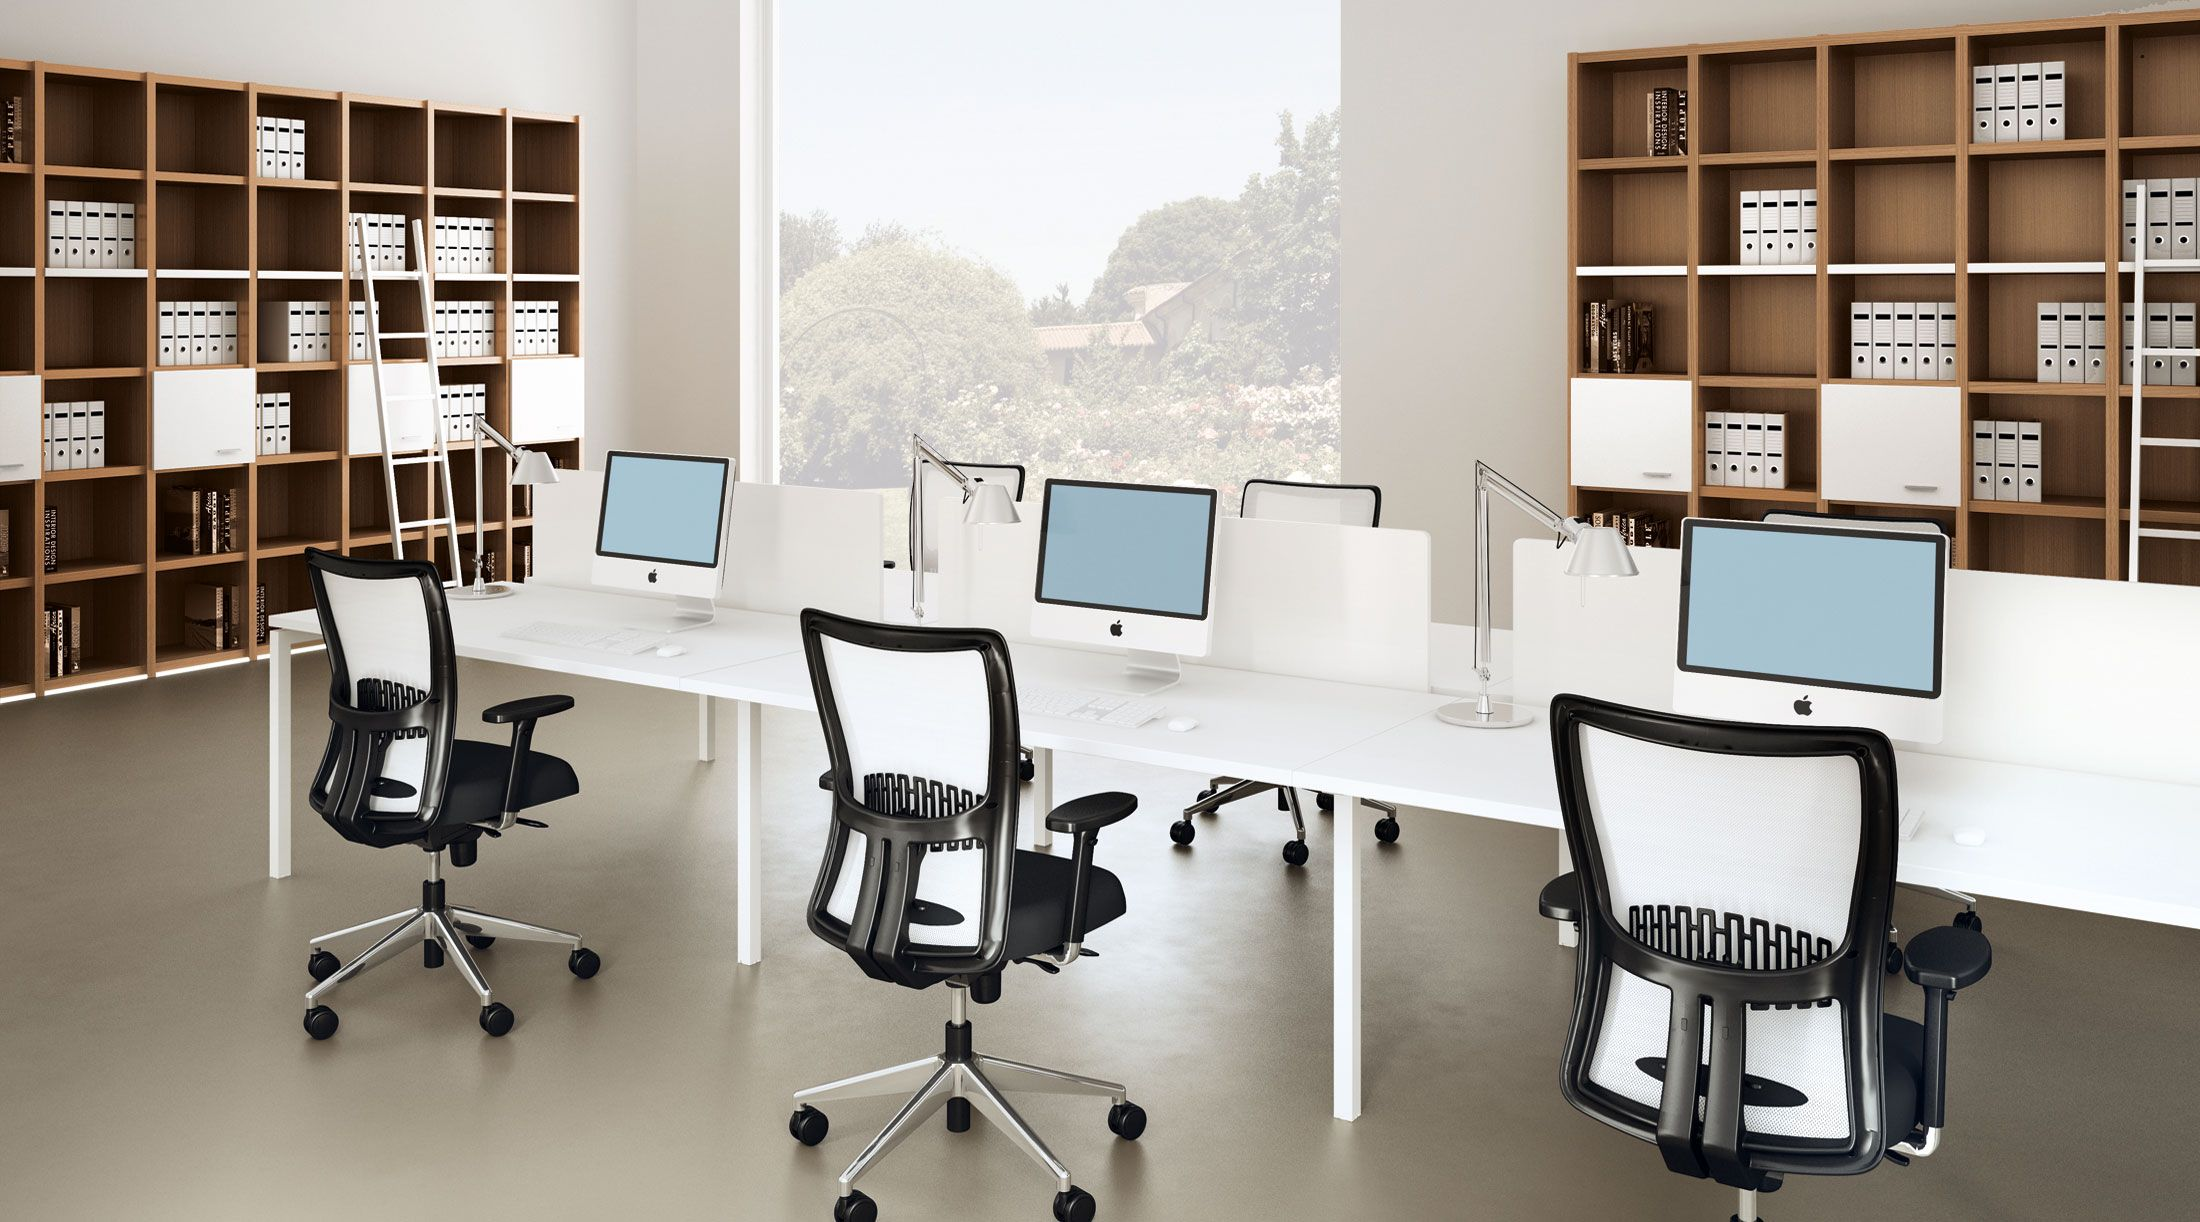 cool offices desks white home office modern. Desk Ideas Home Office Interior Design Small\u2026 Cool Offices Desks White Modern E